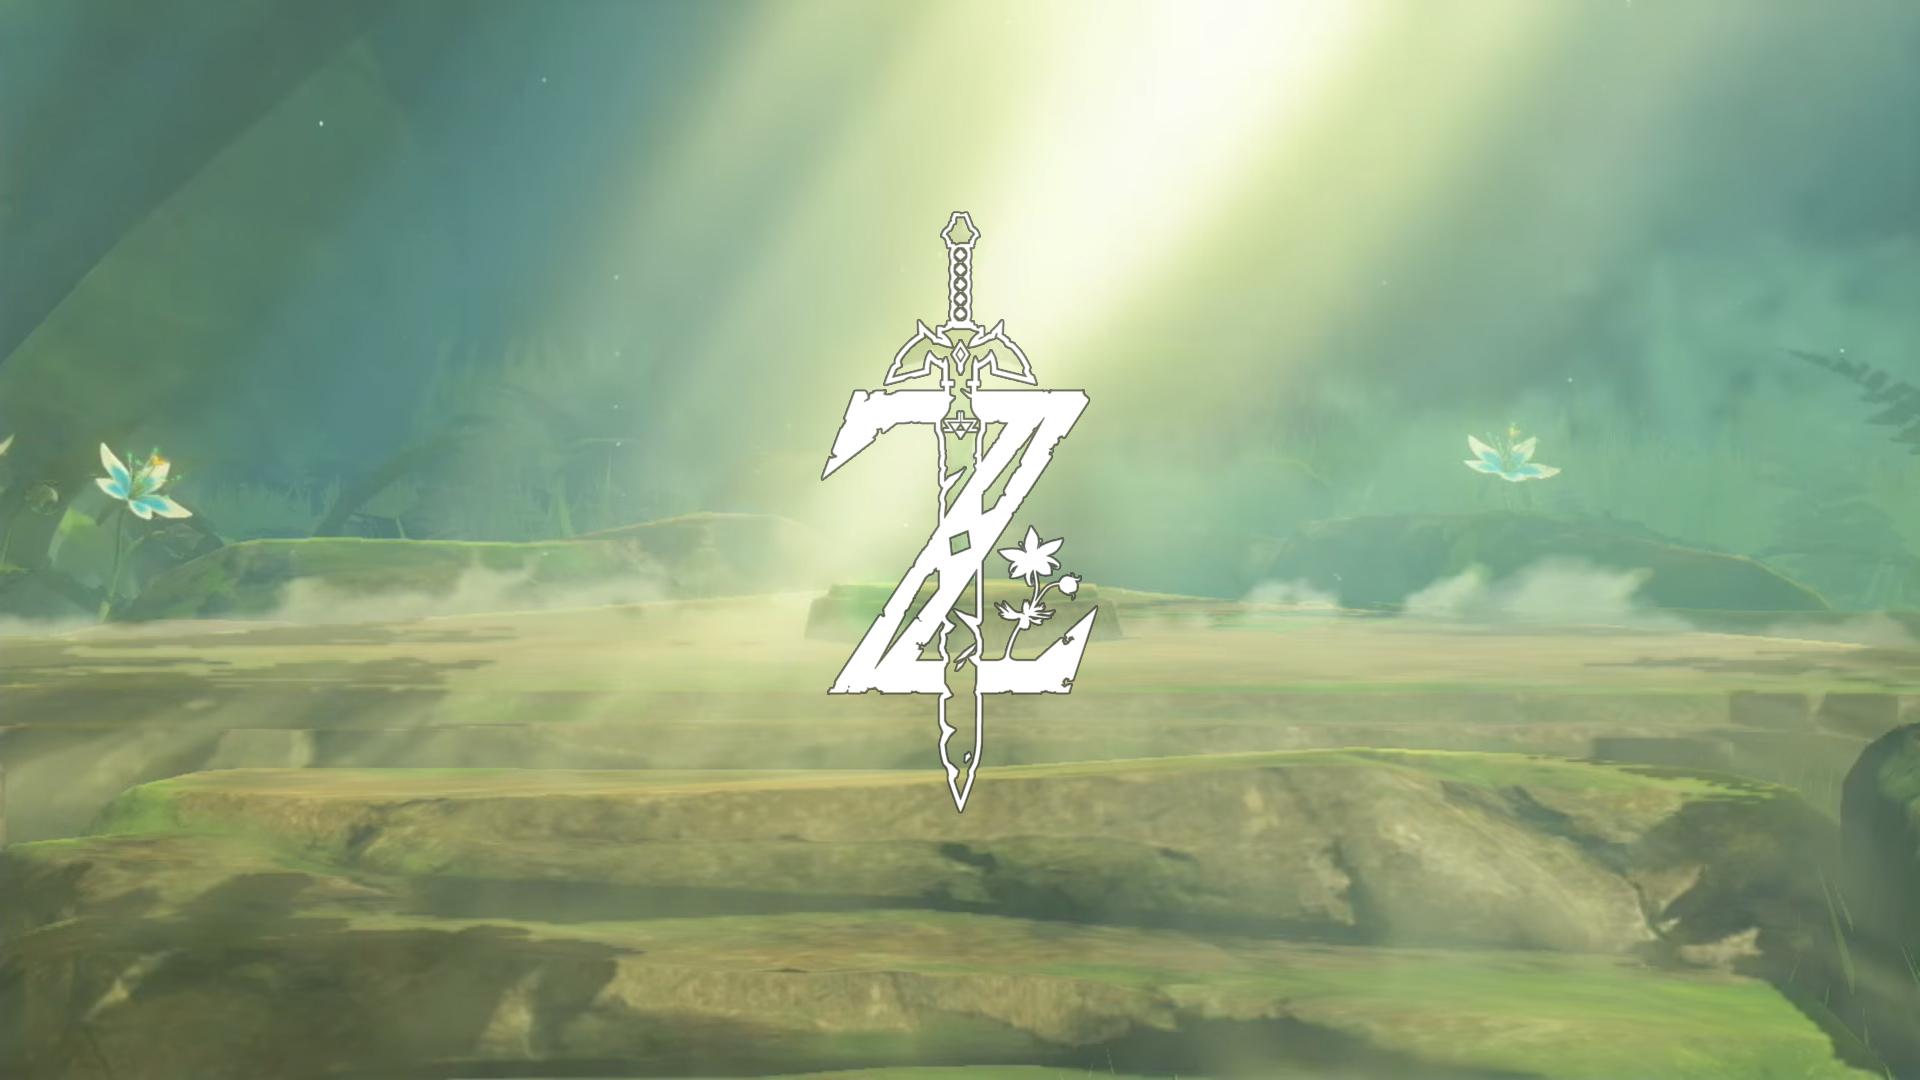 Zelda Breath Of The Wild Wallpaper 1080p: Fondos De The Legend Of Zelda Breath Of The Wild, Wallpapers